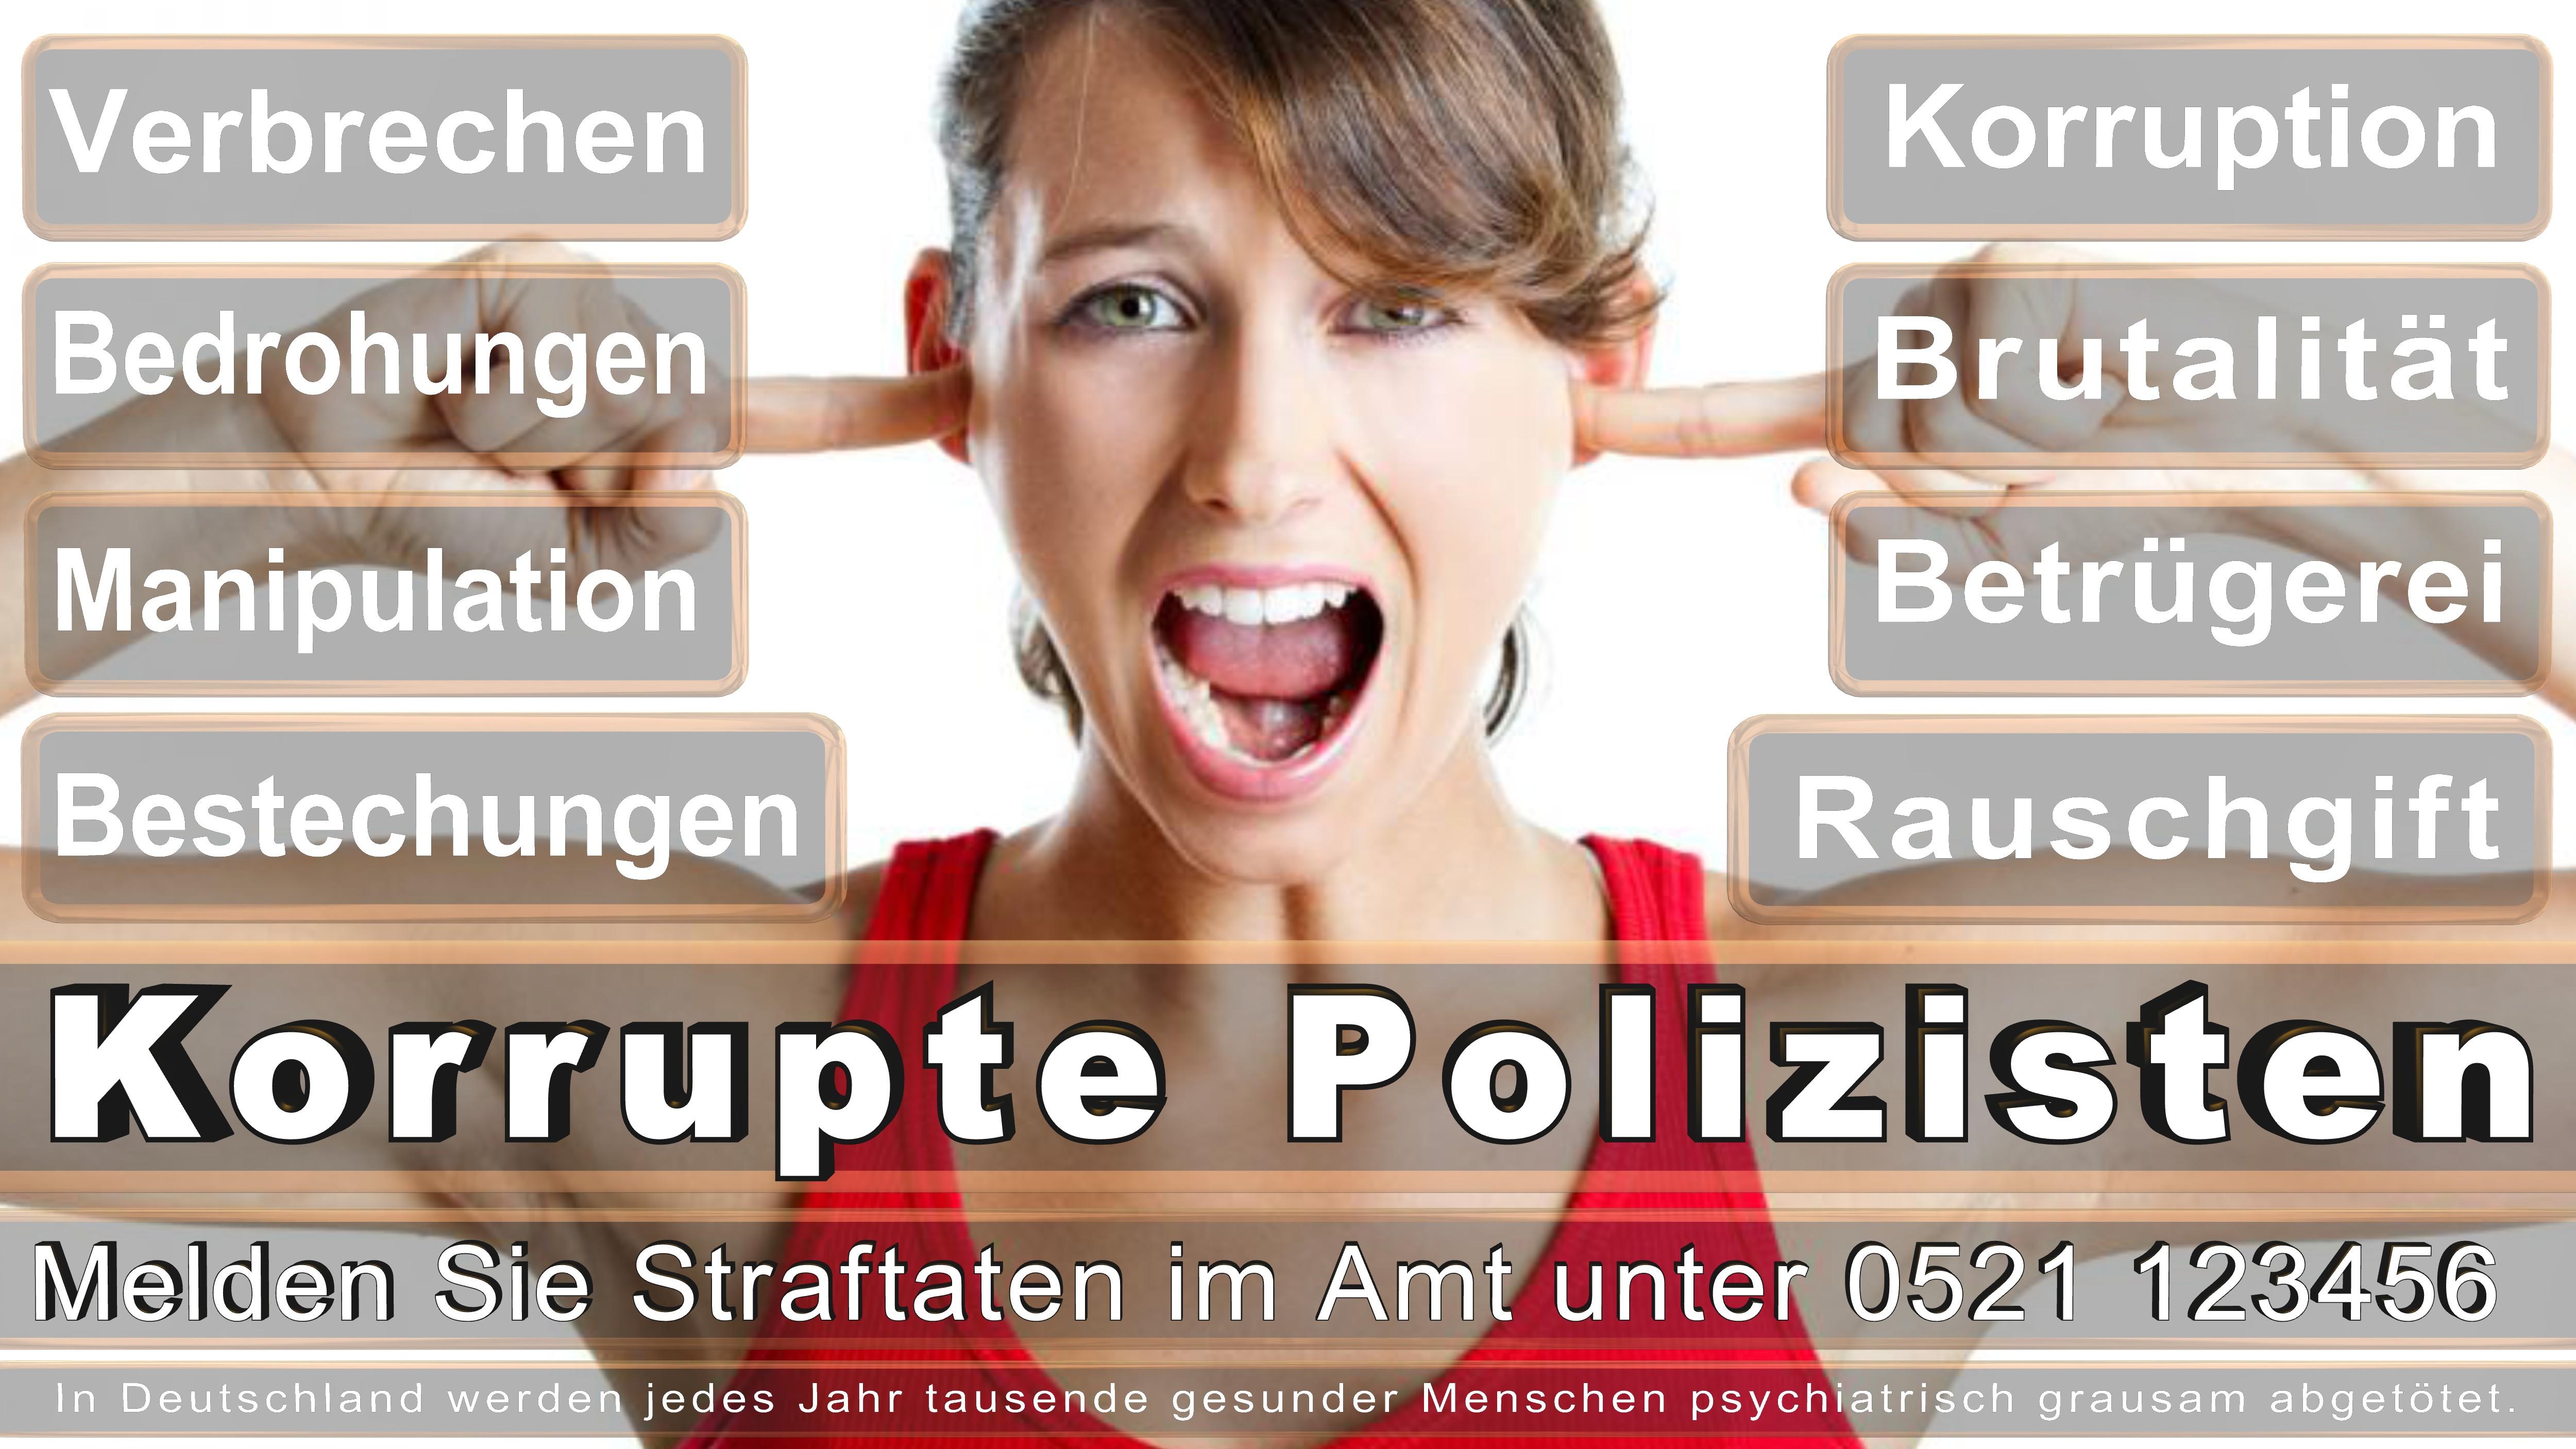 Polizei-Bielefeld-Polizei-Bielefeld-Polizei-Bielefeld (177)